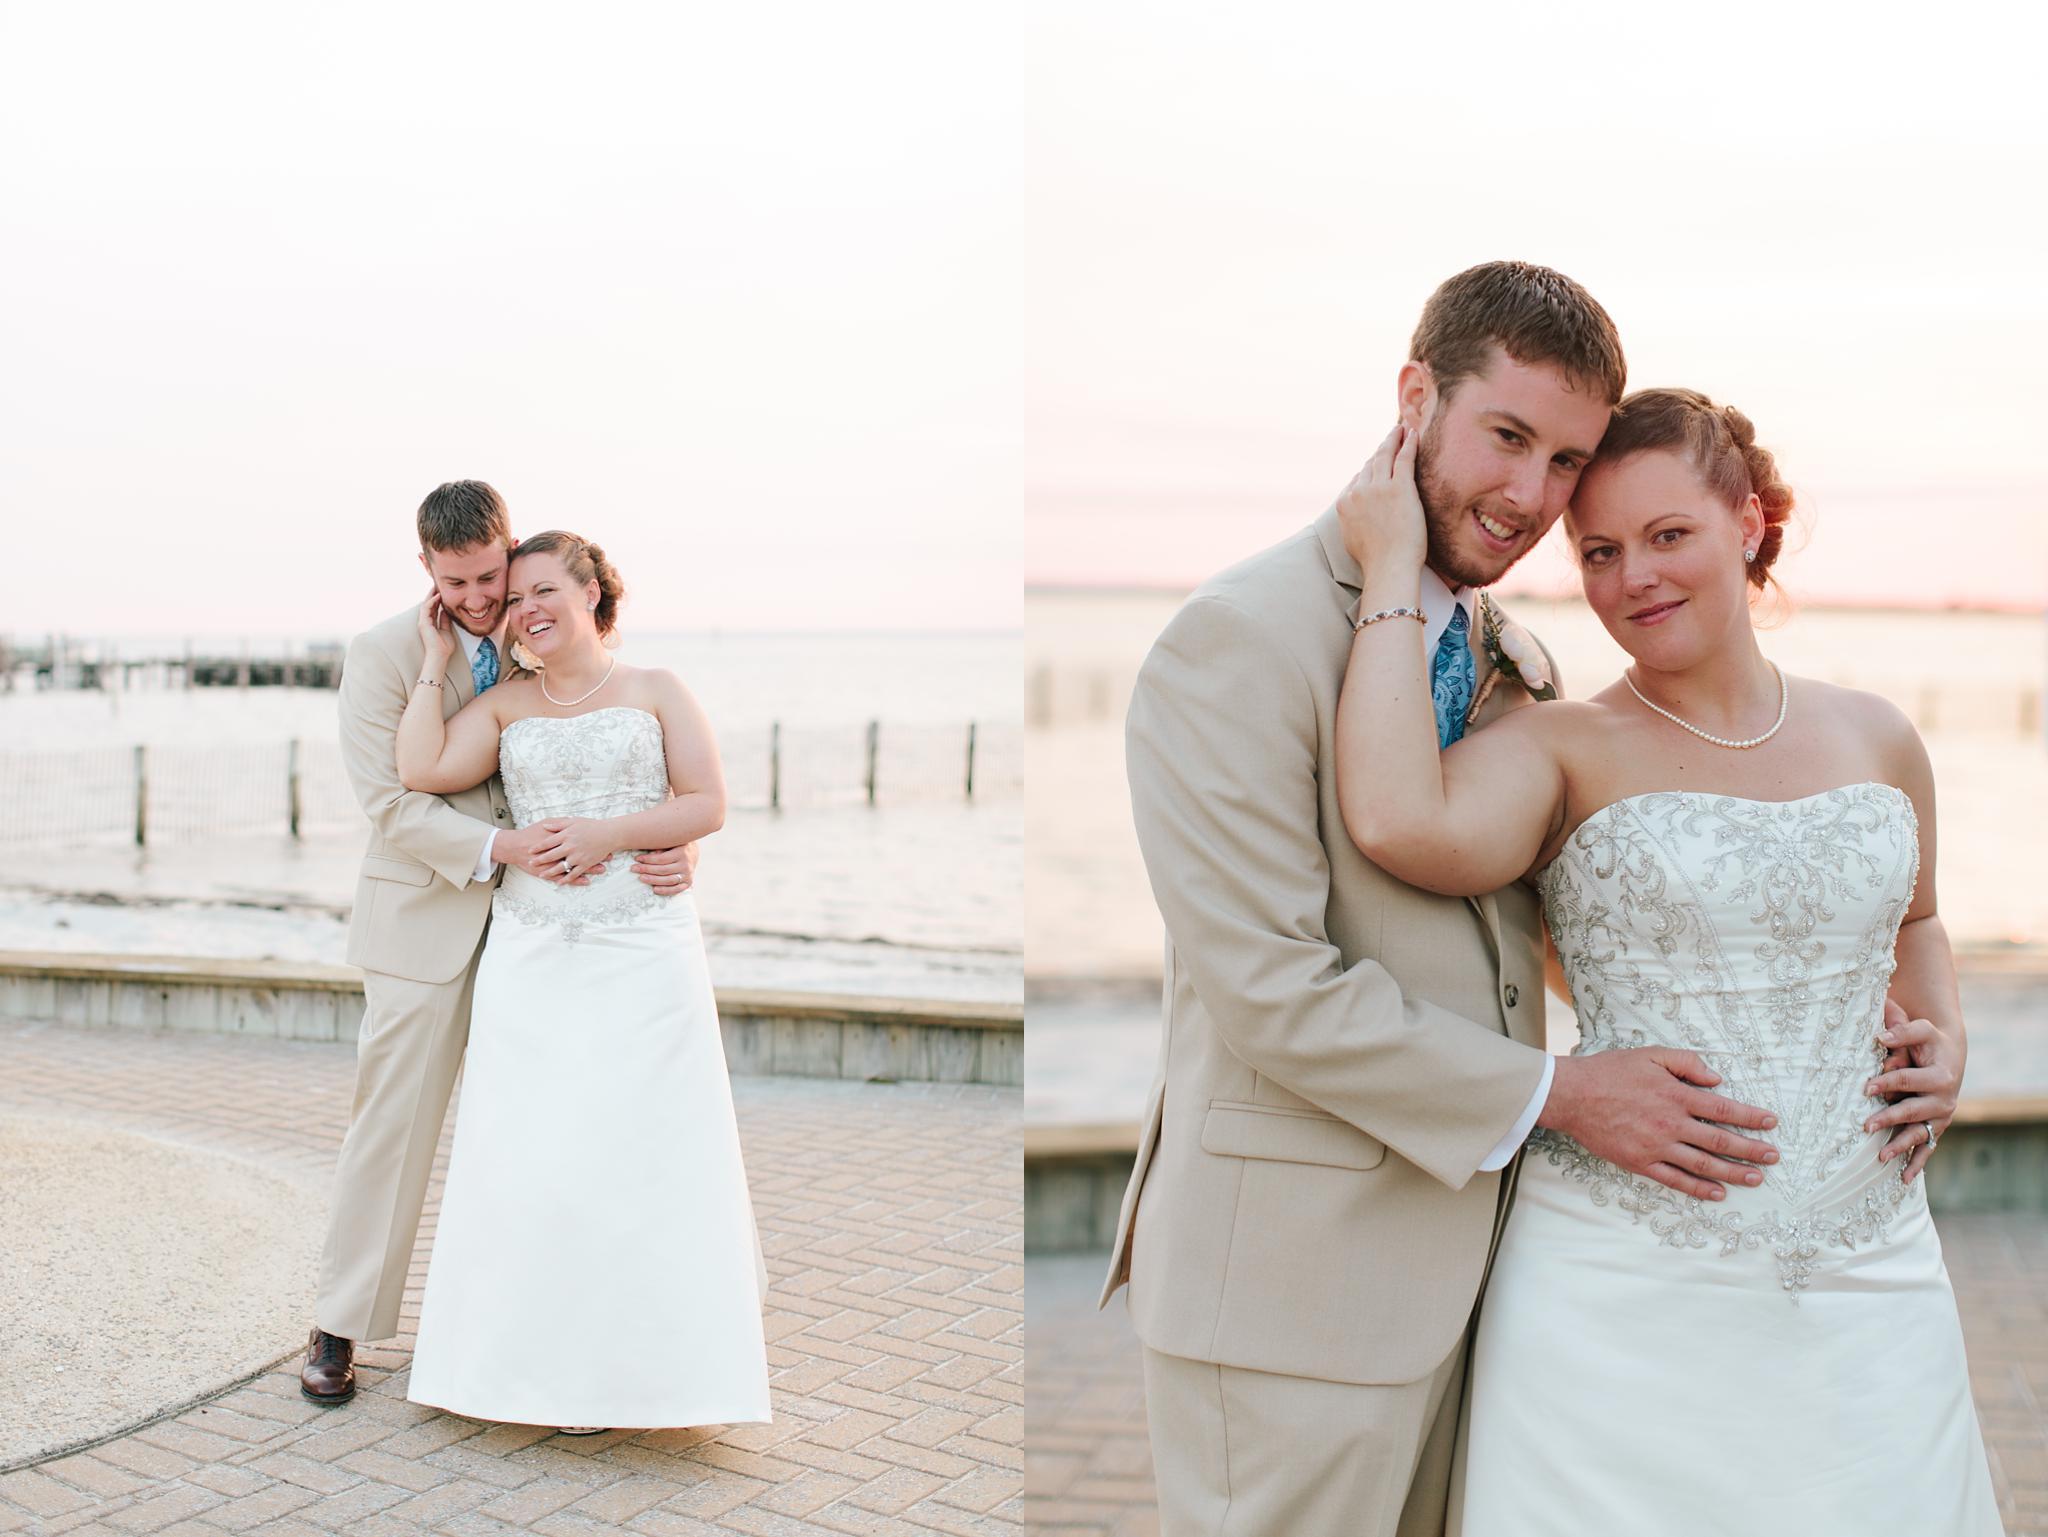 brant_beach_yacht_club_wedding_long_beach_island_nj_wedding_photographer_1108.jpg